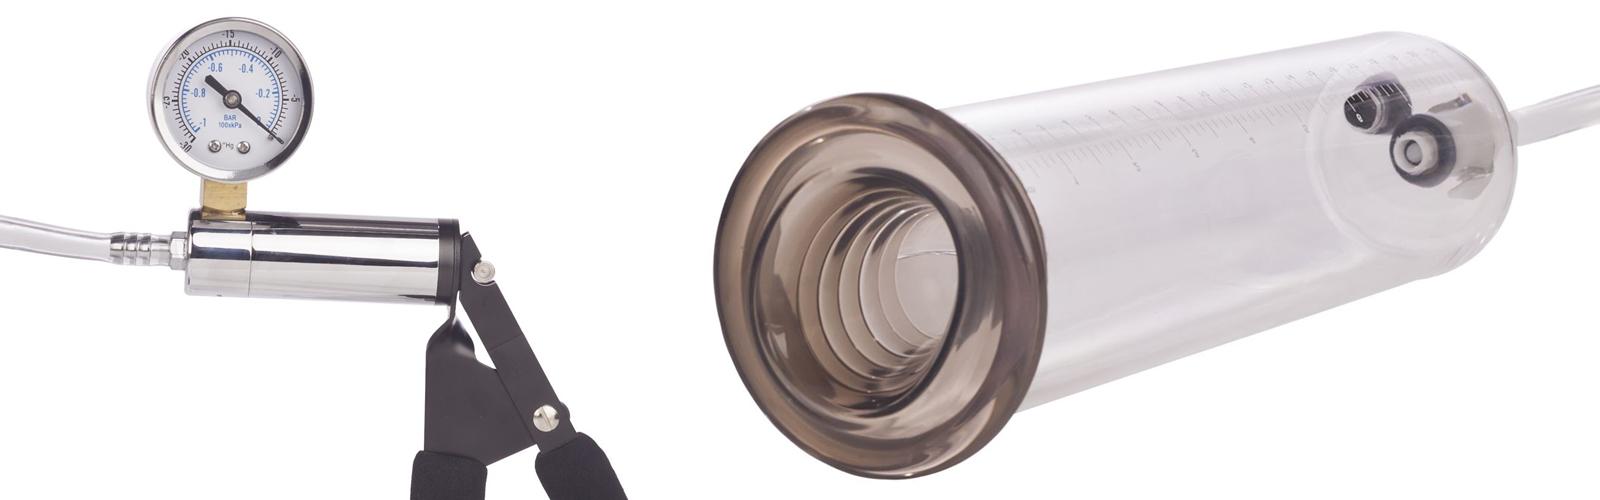 Penis pump and pressure gauge